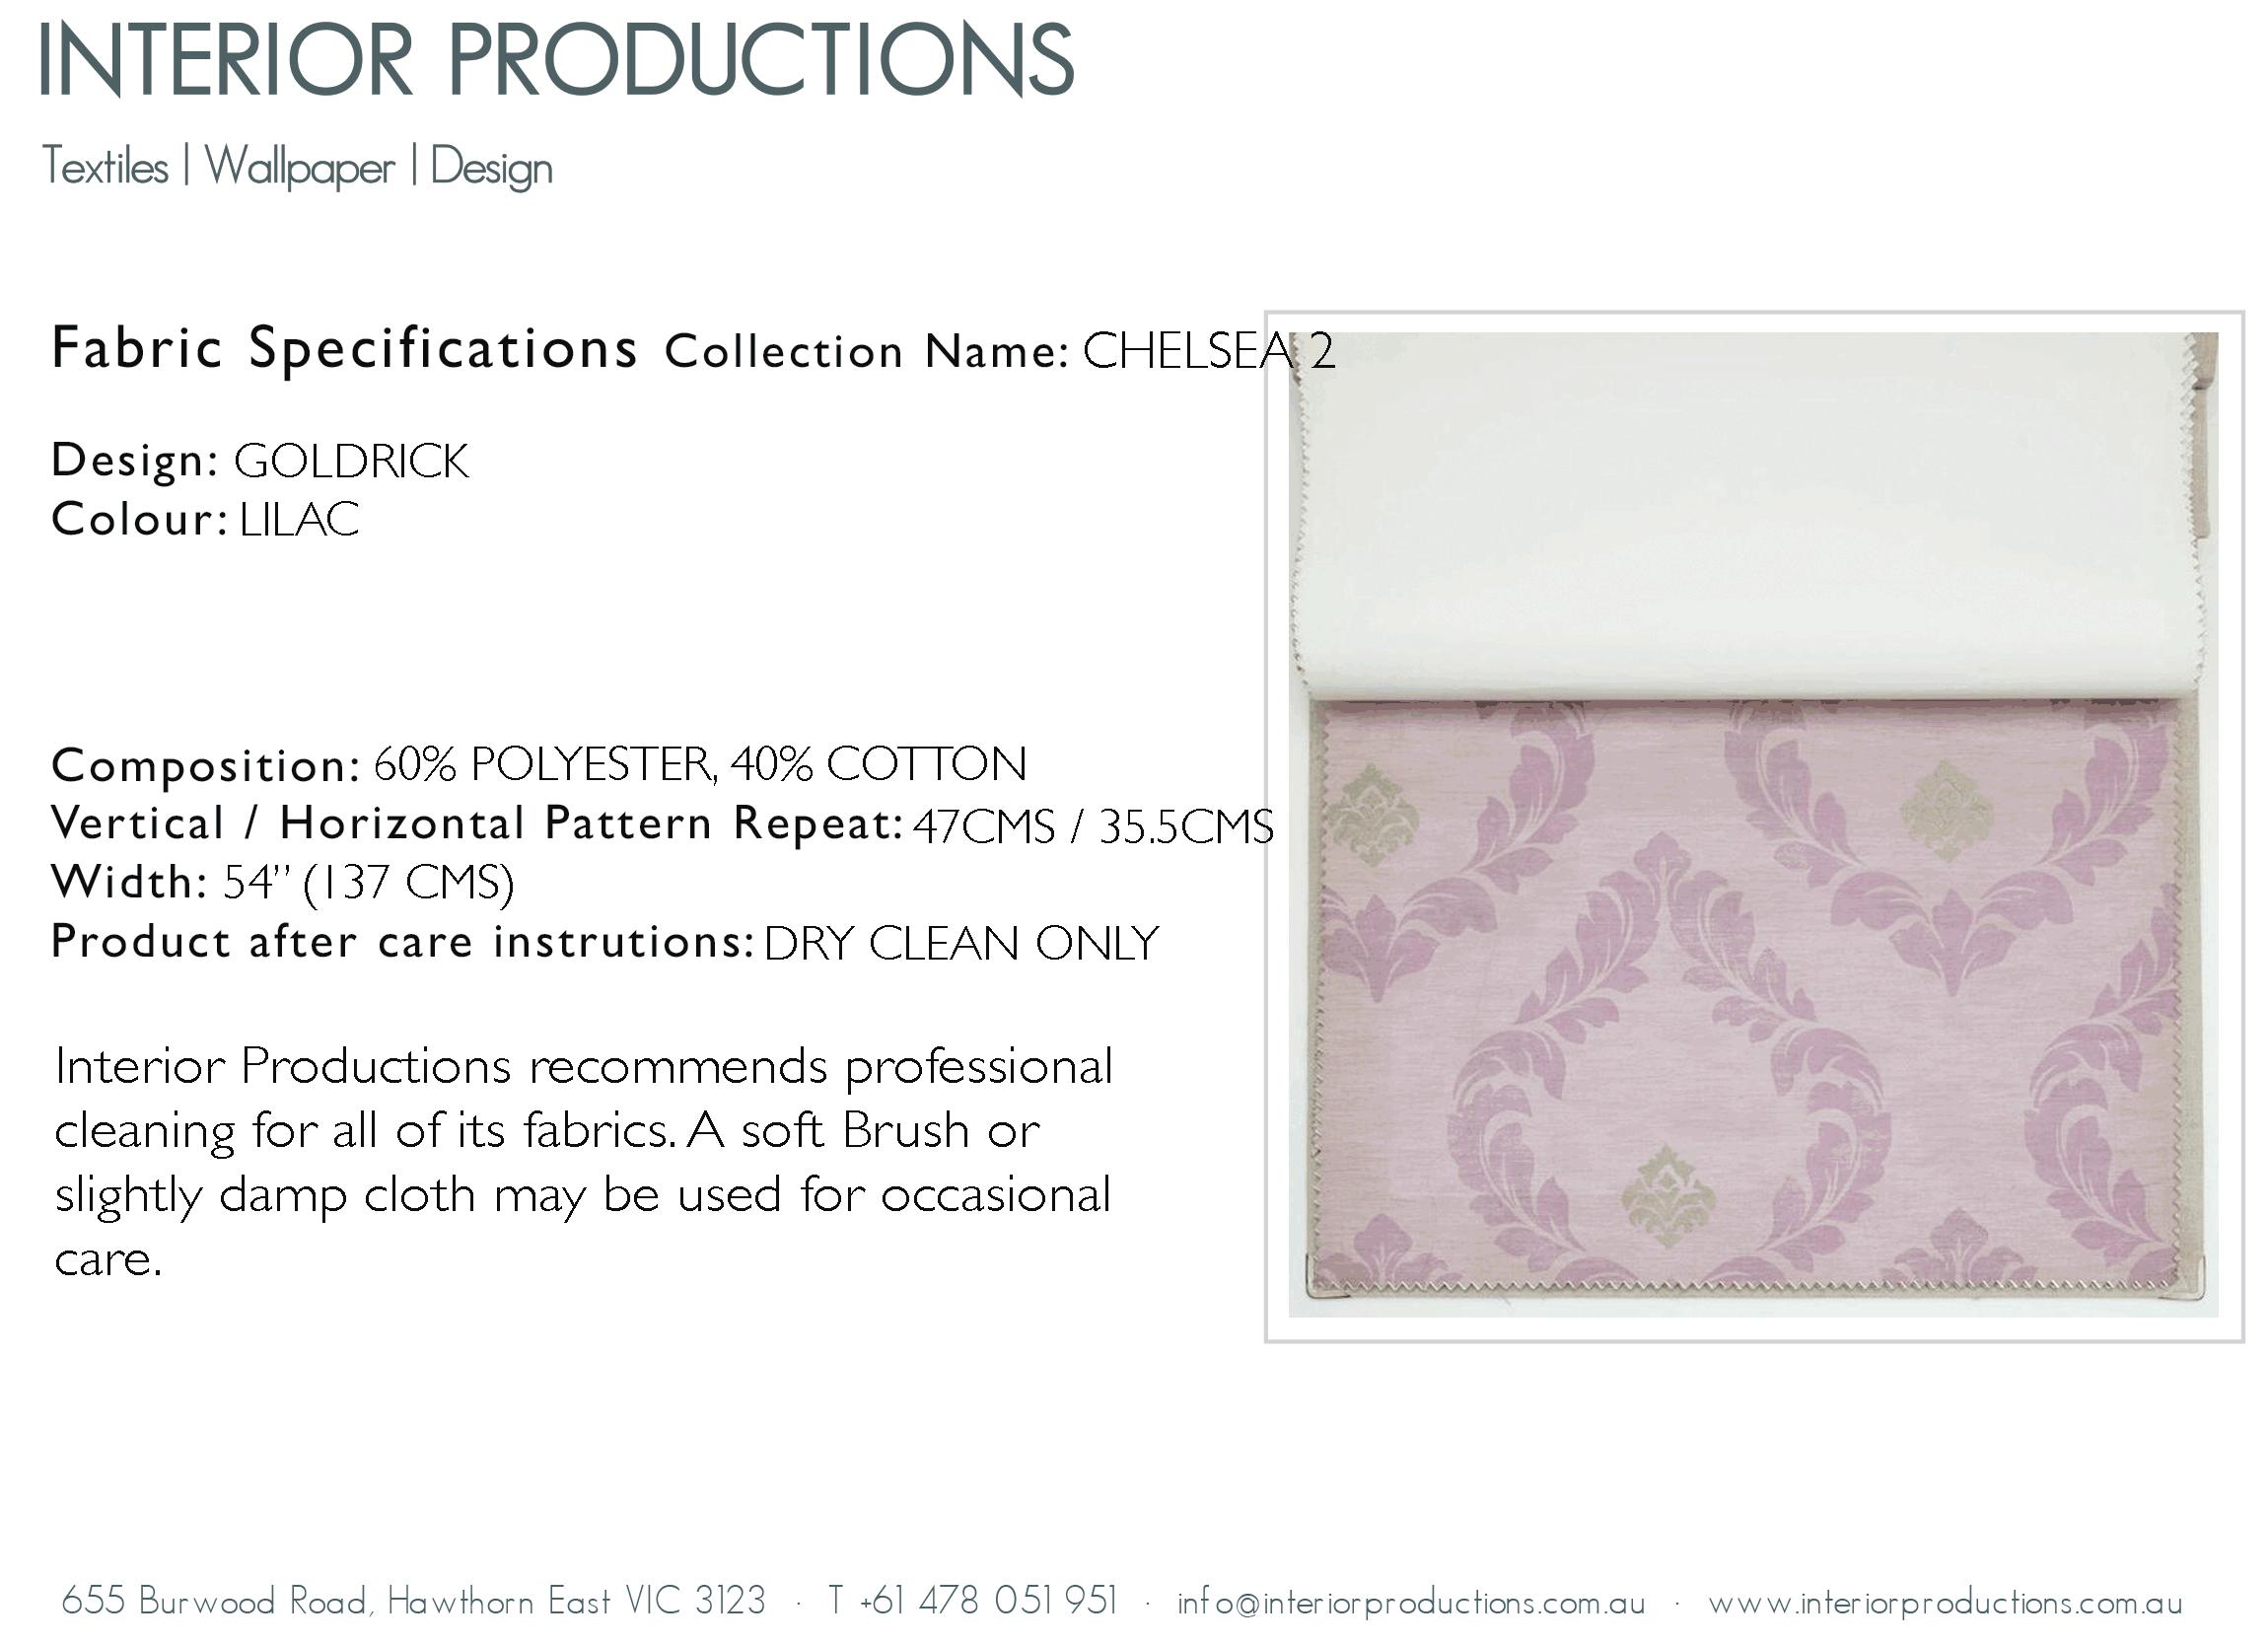 interior_productions_GOLDRICK---LILAC